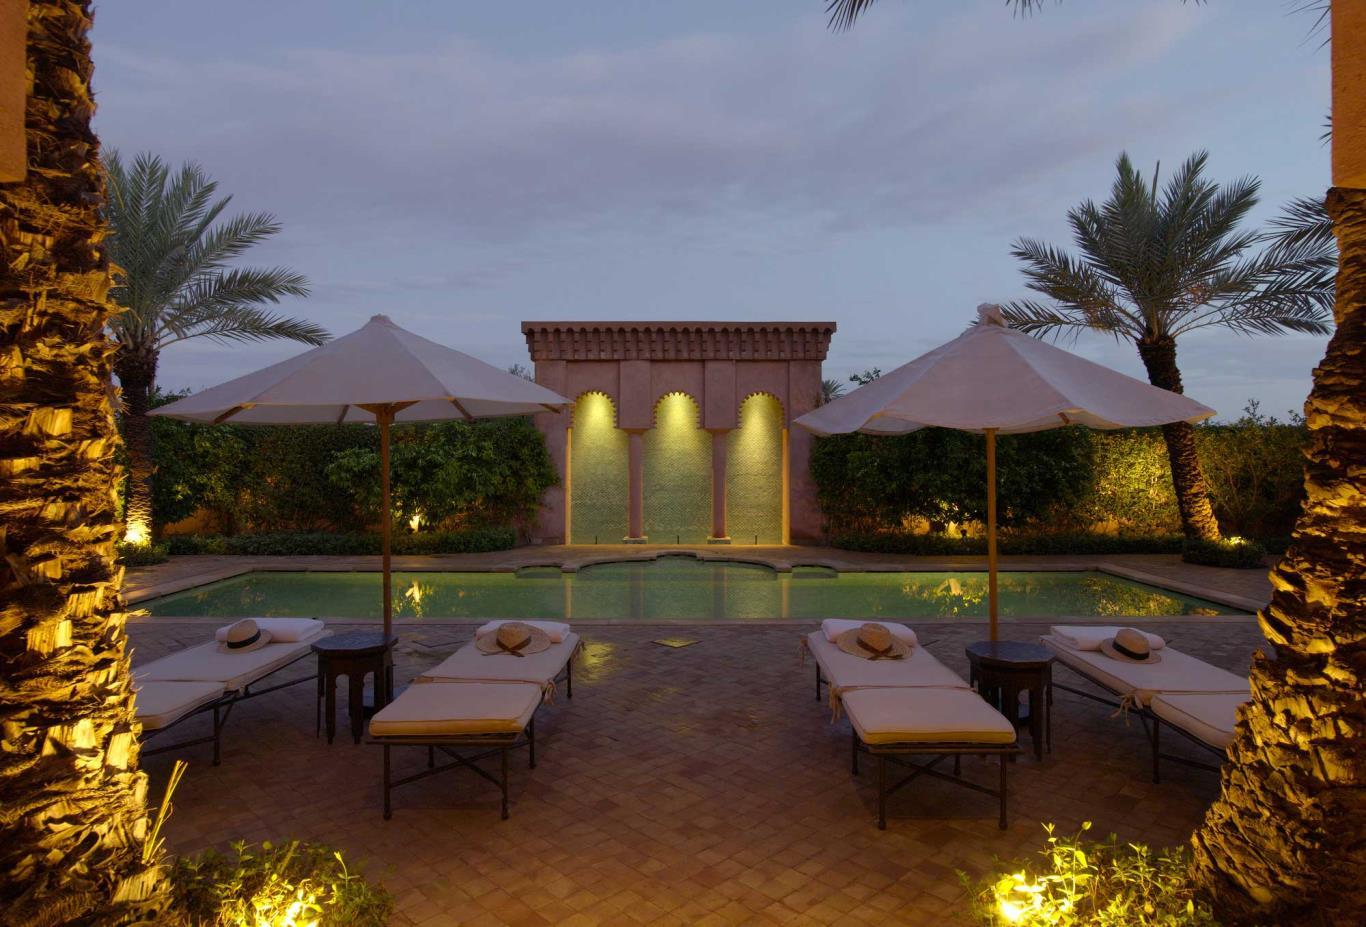 Al-Hamra-Maison-Private-Pool